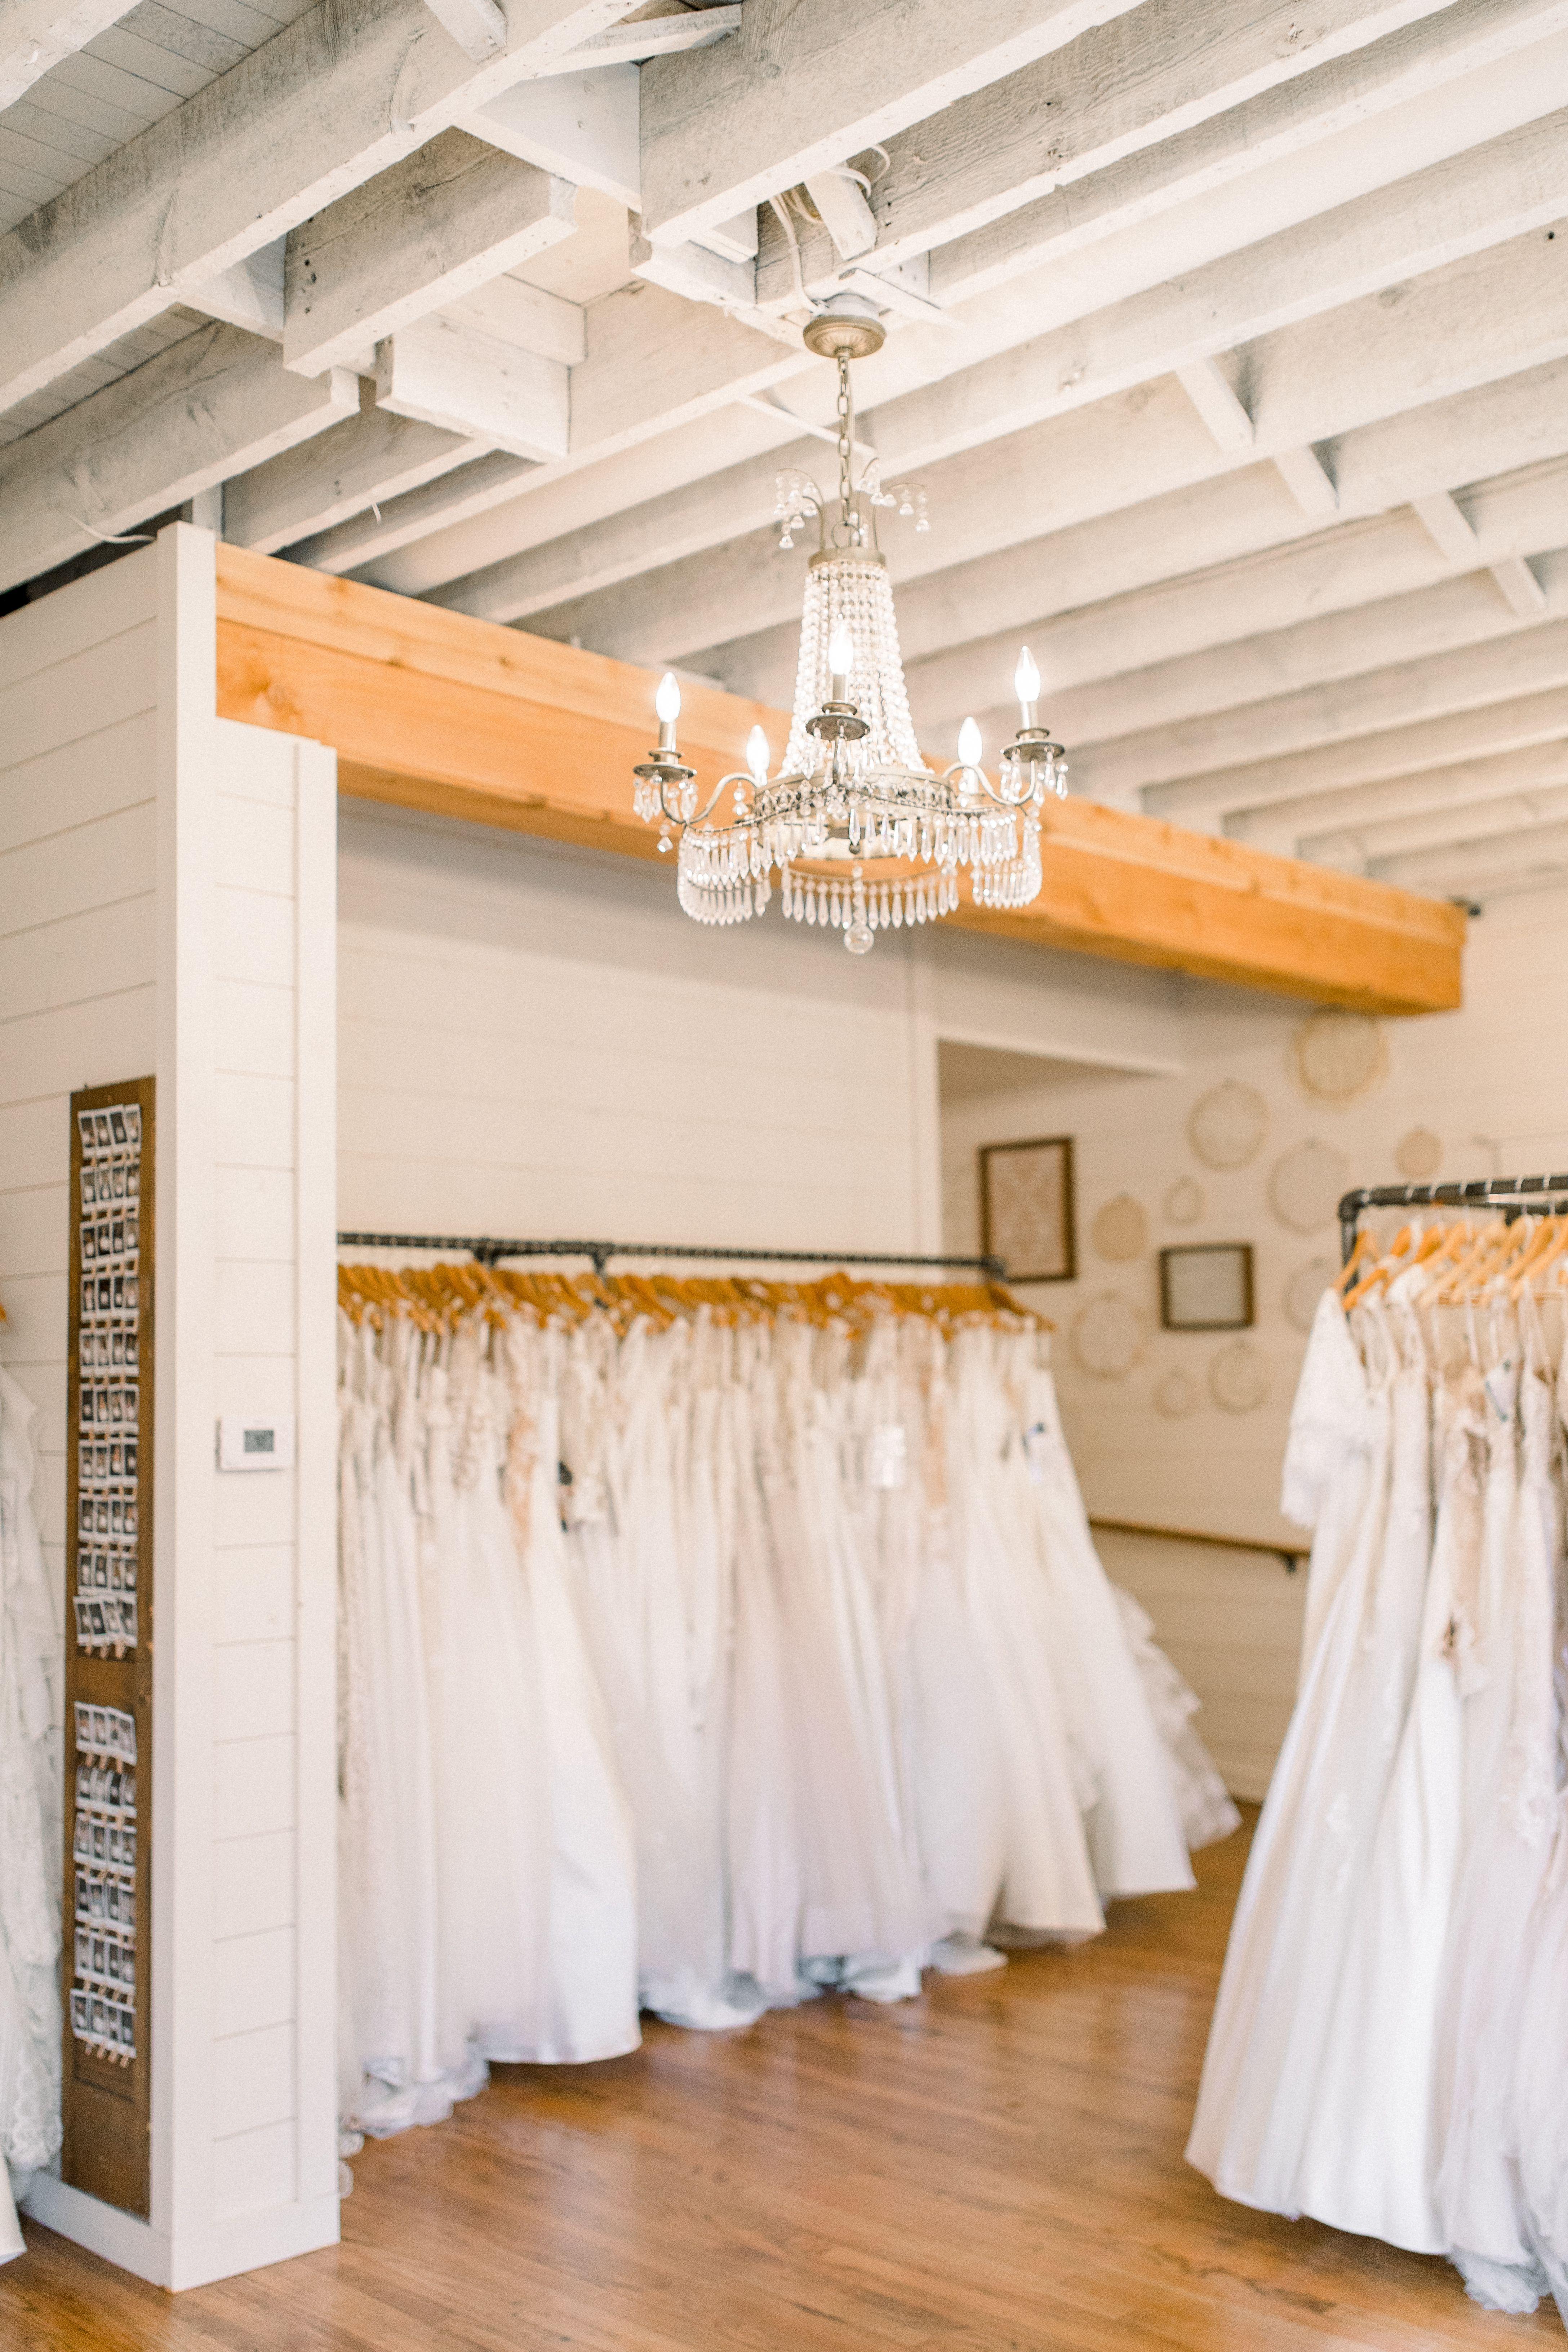 Cleo Bridal   Bridal Store In O'Fallon, Missouri   Bridal stores ...